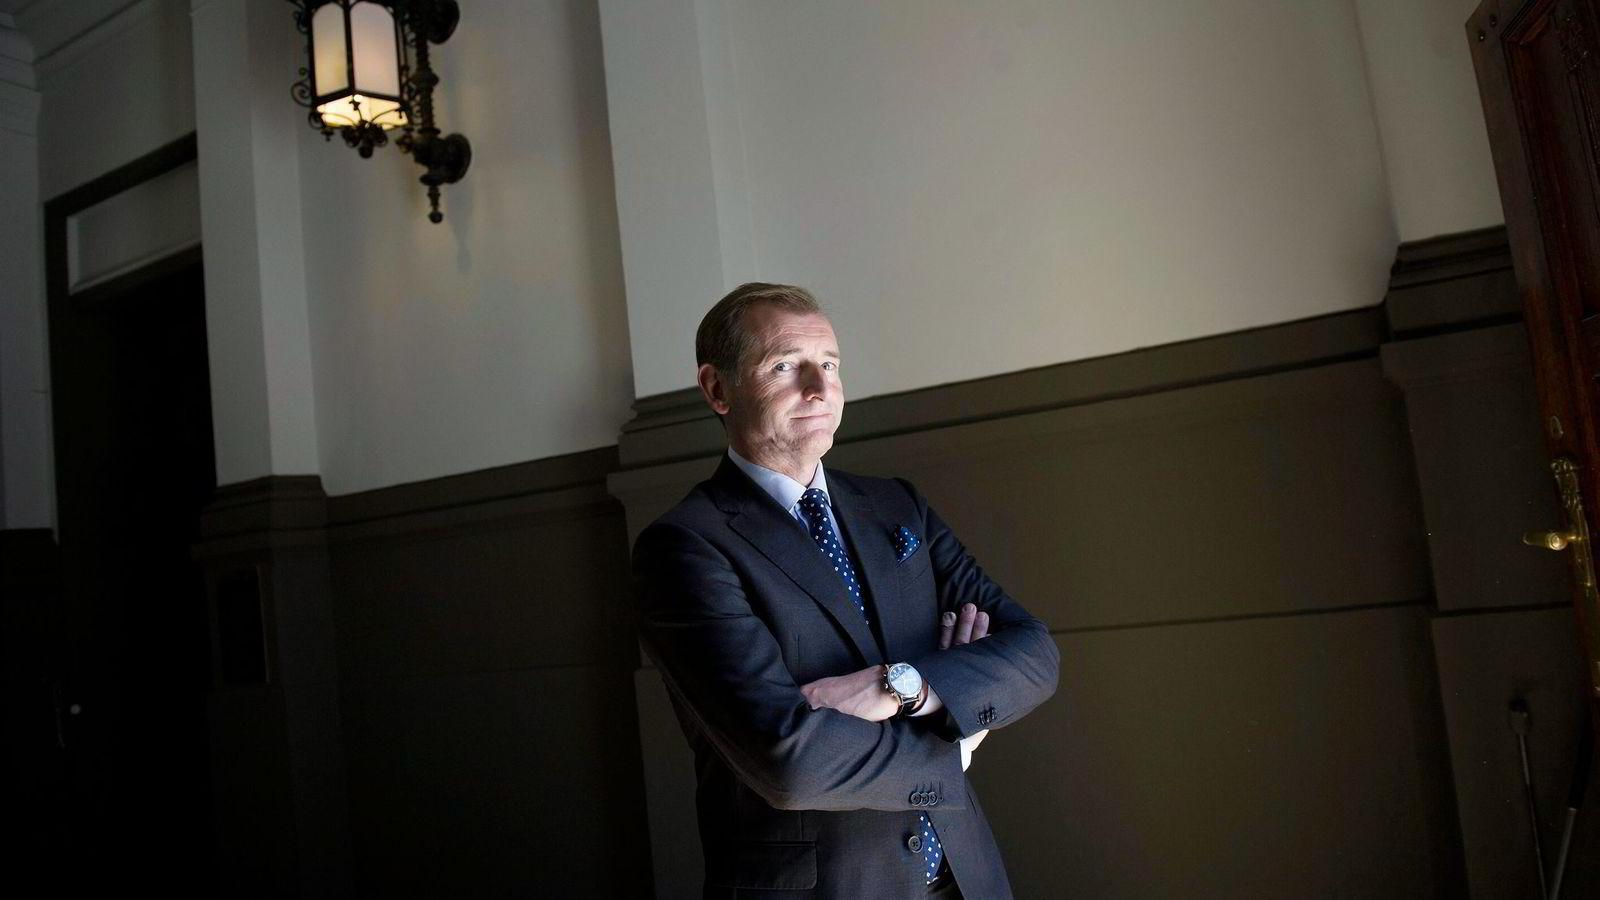 Carl O. Geving, administrerende direktør i Norges Eiendomsmeglerforbund.